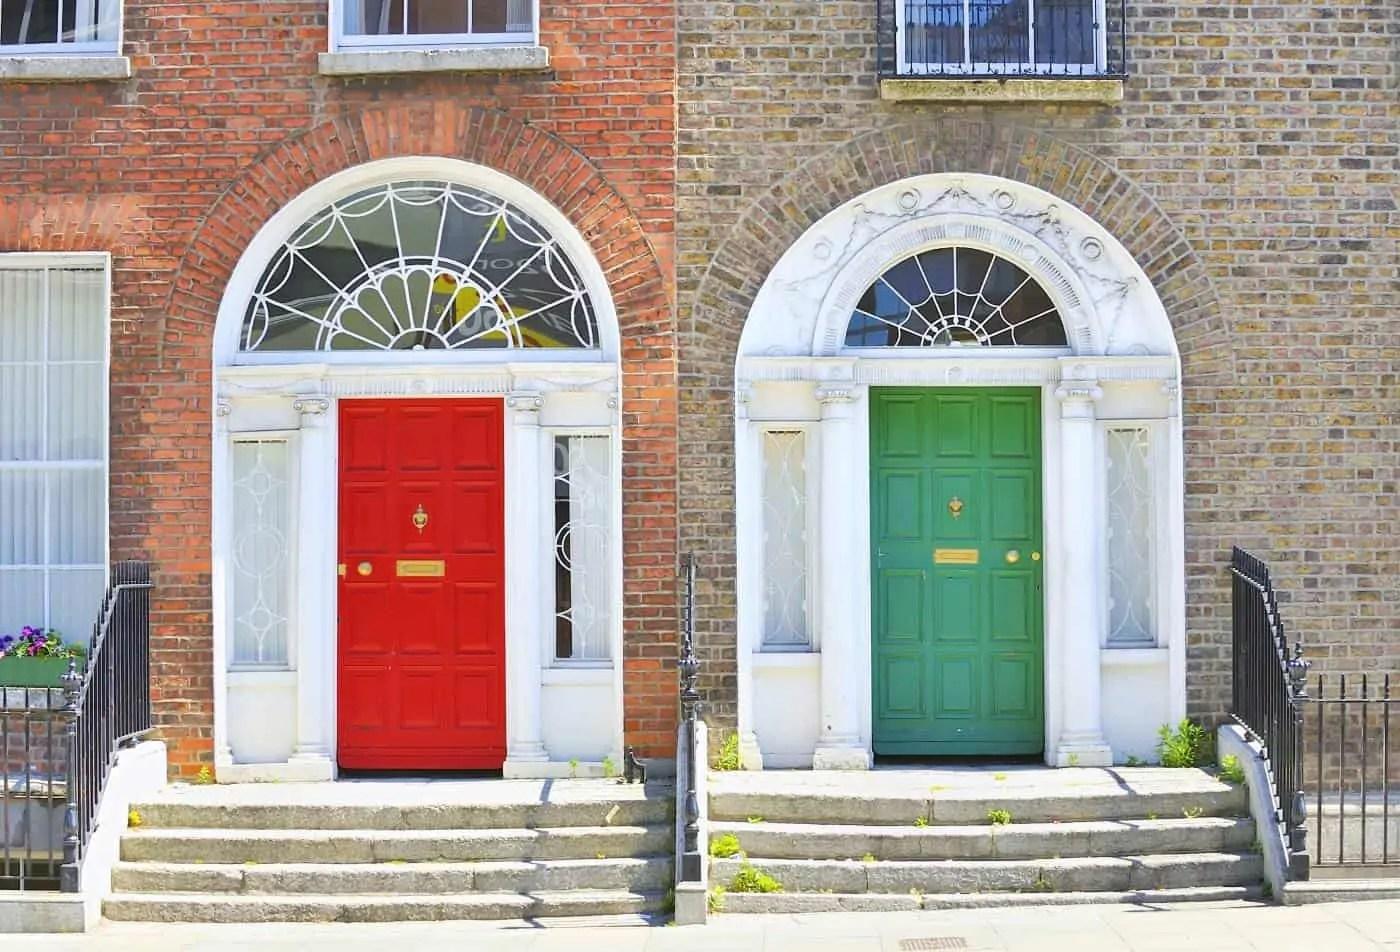 Georgian doors in Dublin's Merrion Square | c/o Deposit Photos